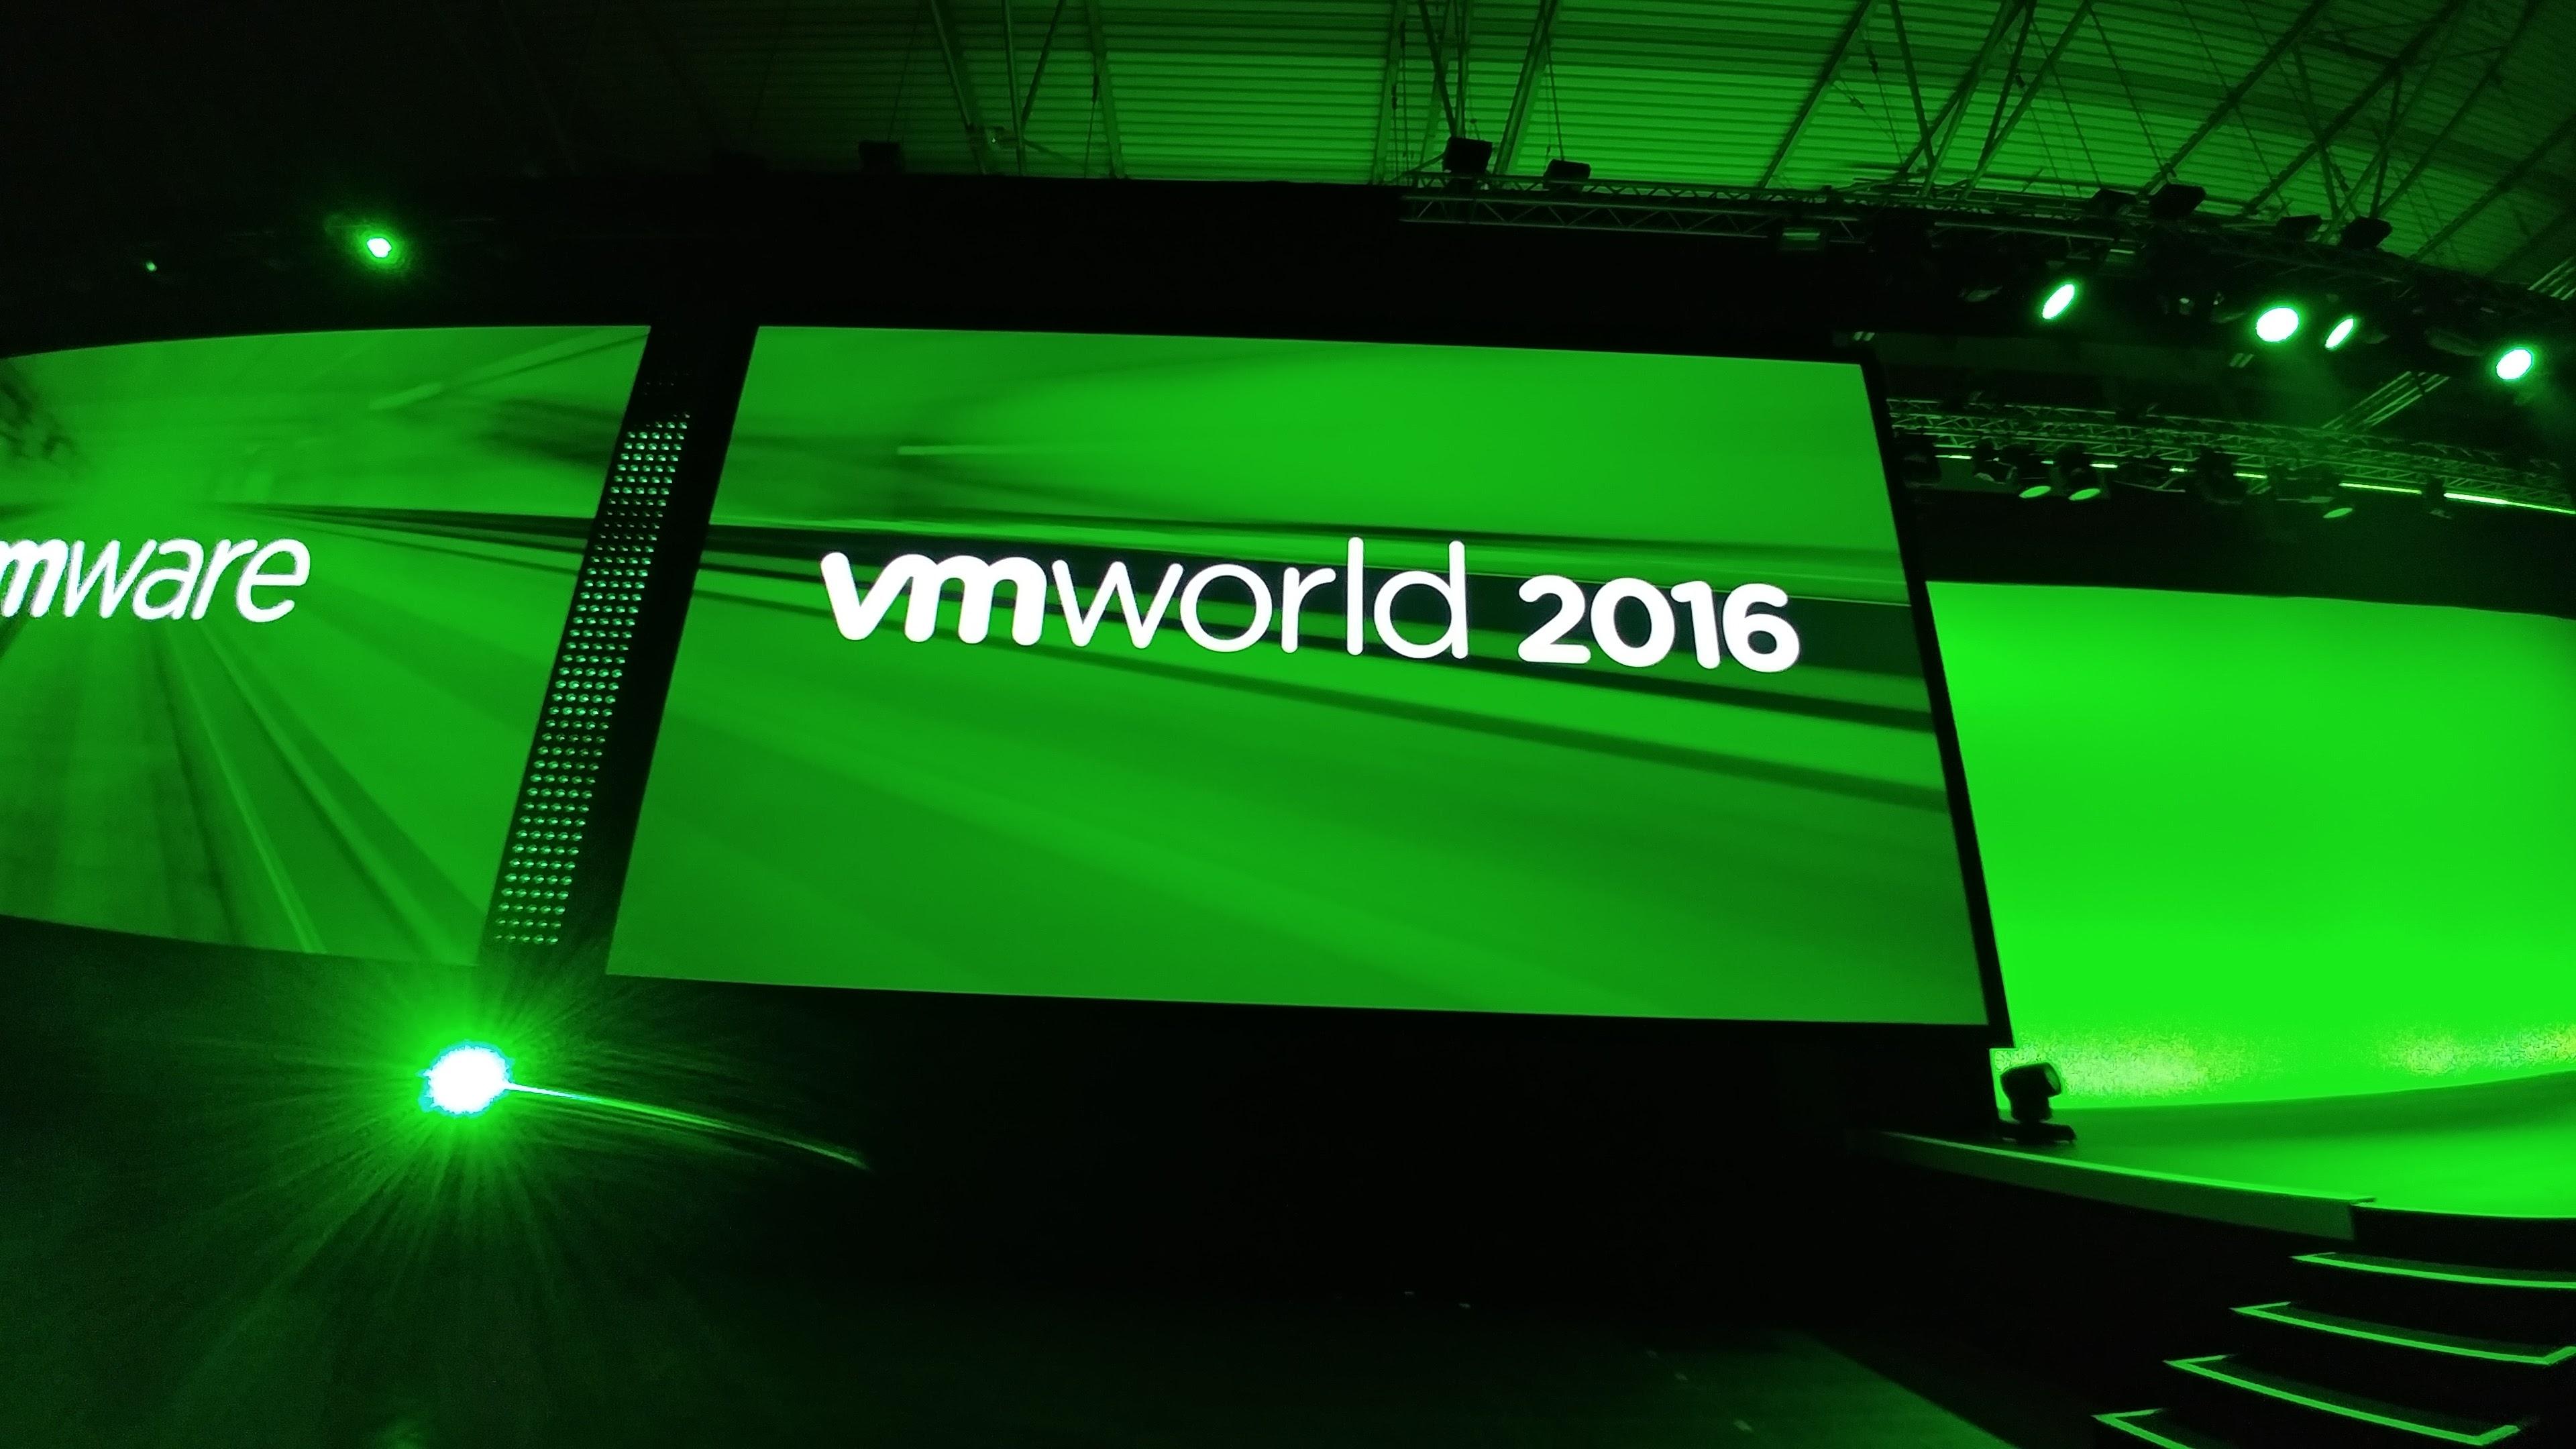 VMware VMworld Europe 2016 Barcellona